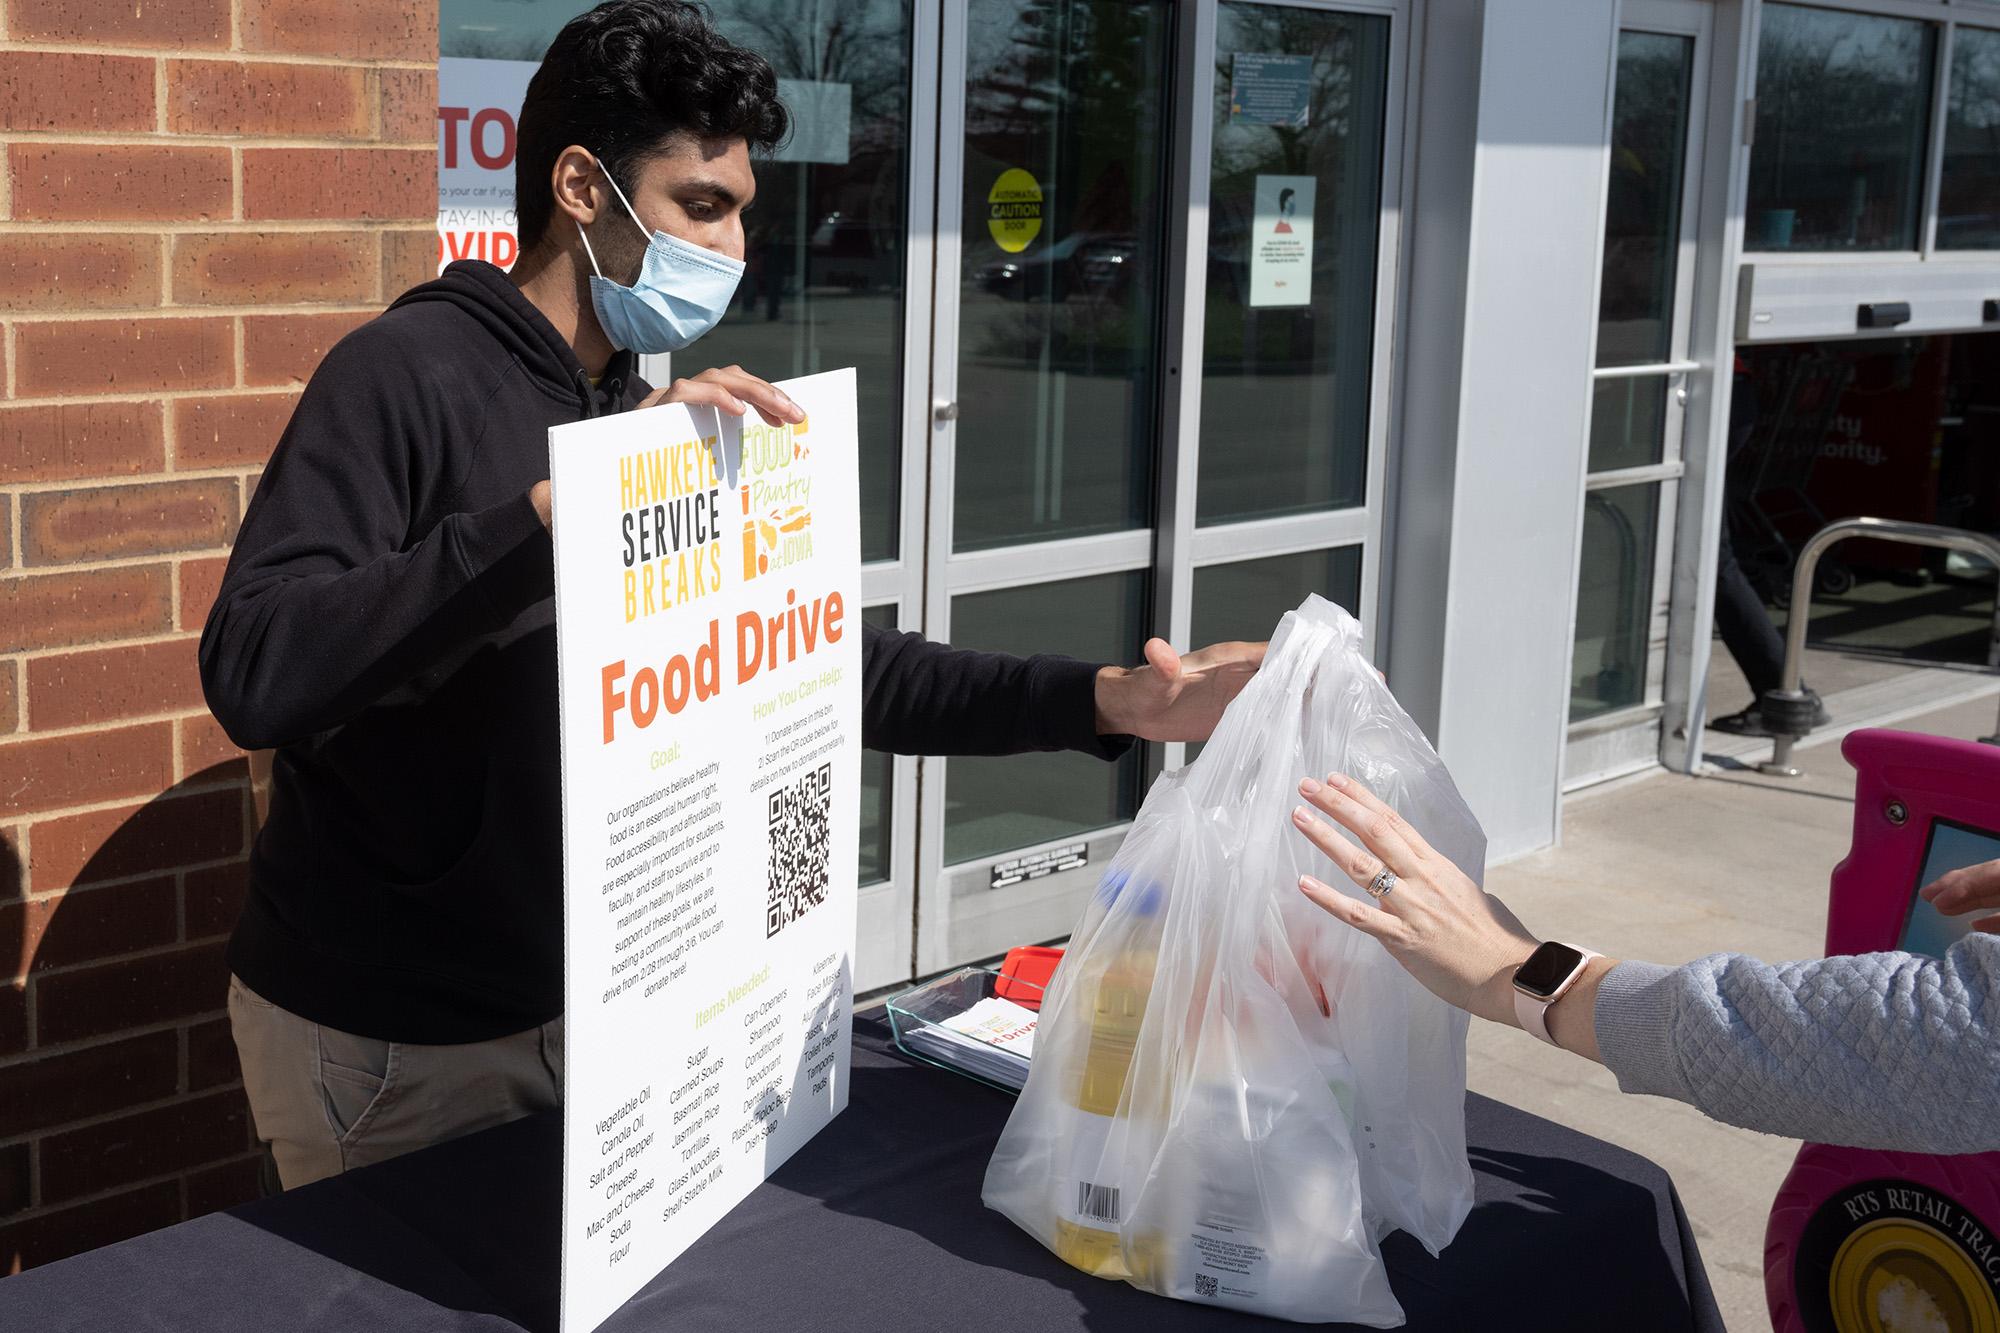 Prateek Raikwar, a third-year neuroscience and music major from Iowa City, works at a food drive for Hawkeye Service Breaks